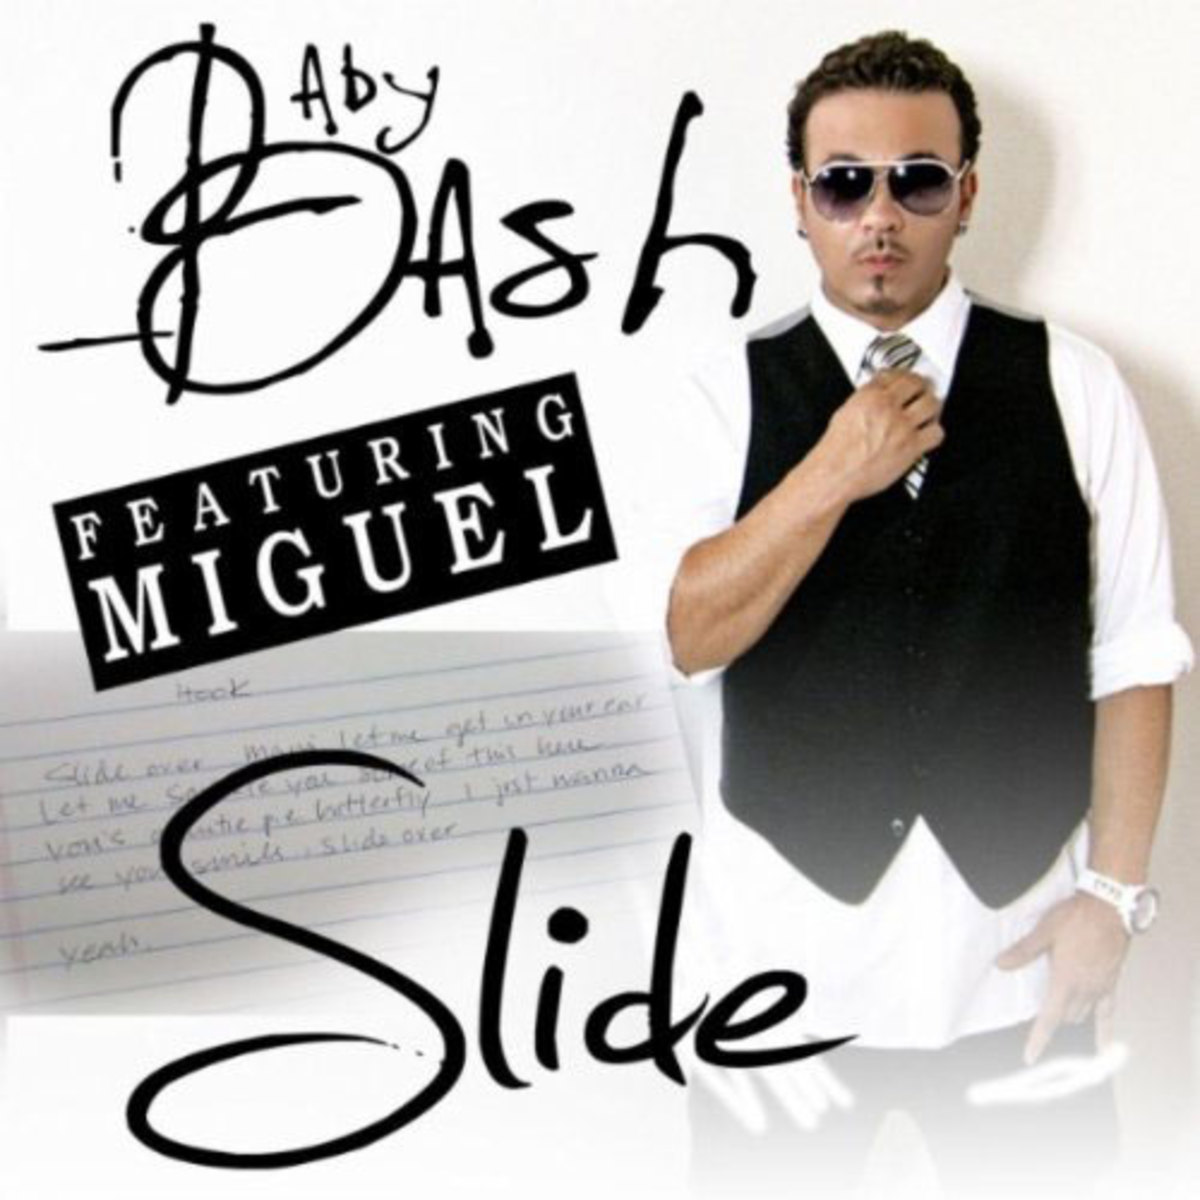 babybash-slide.jpg